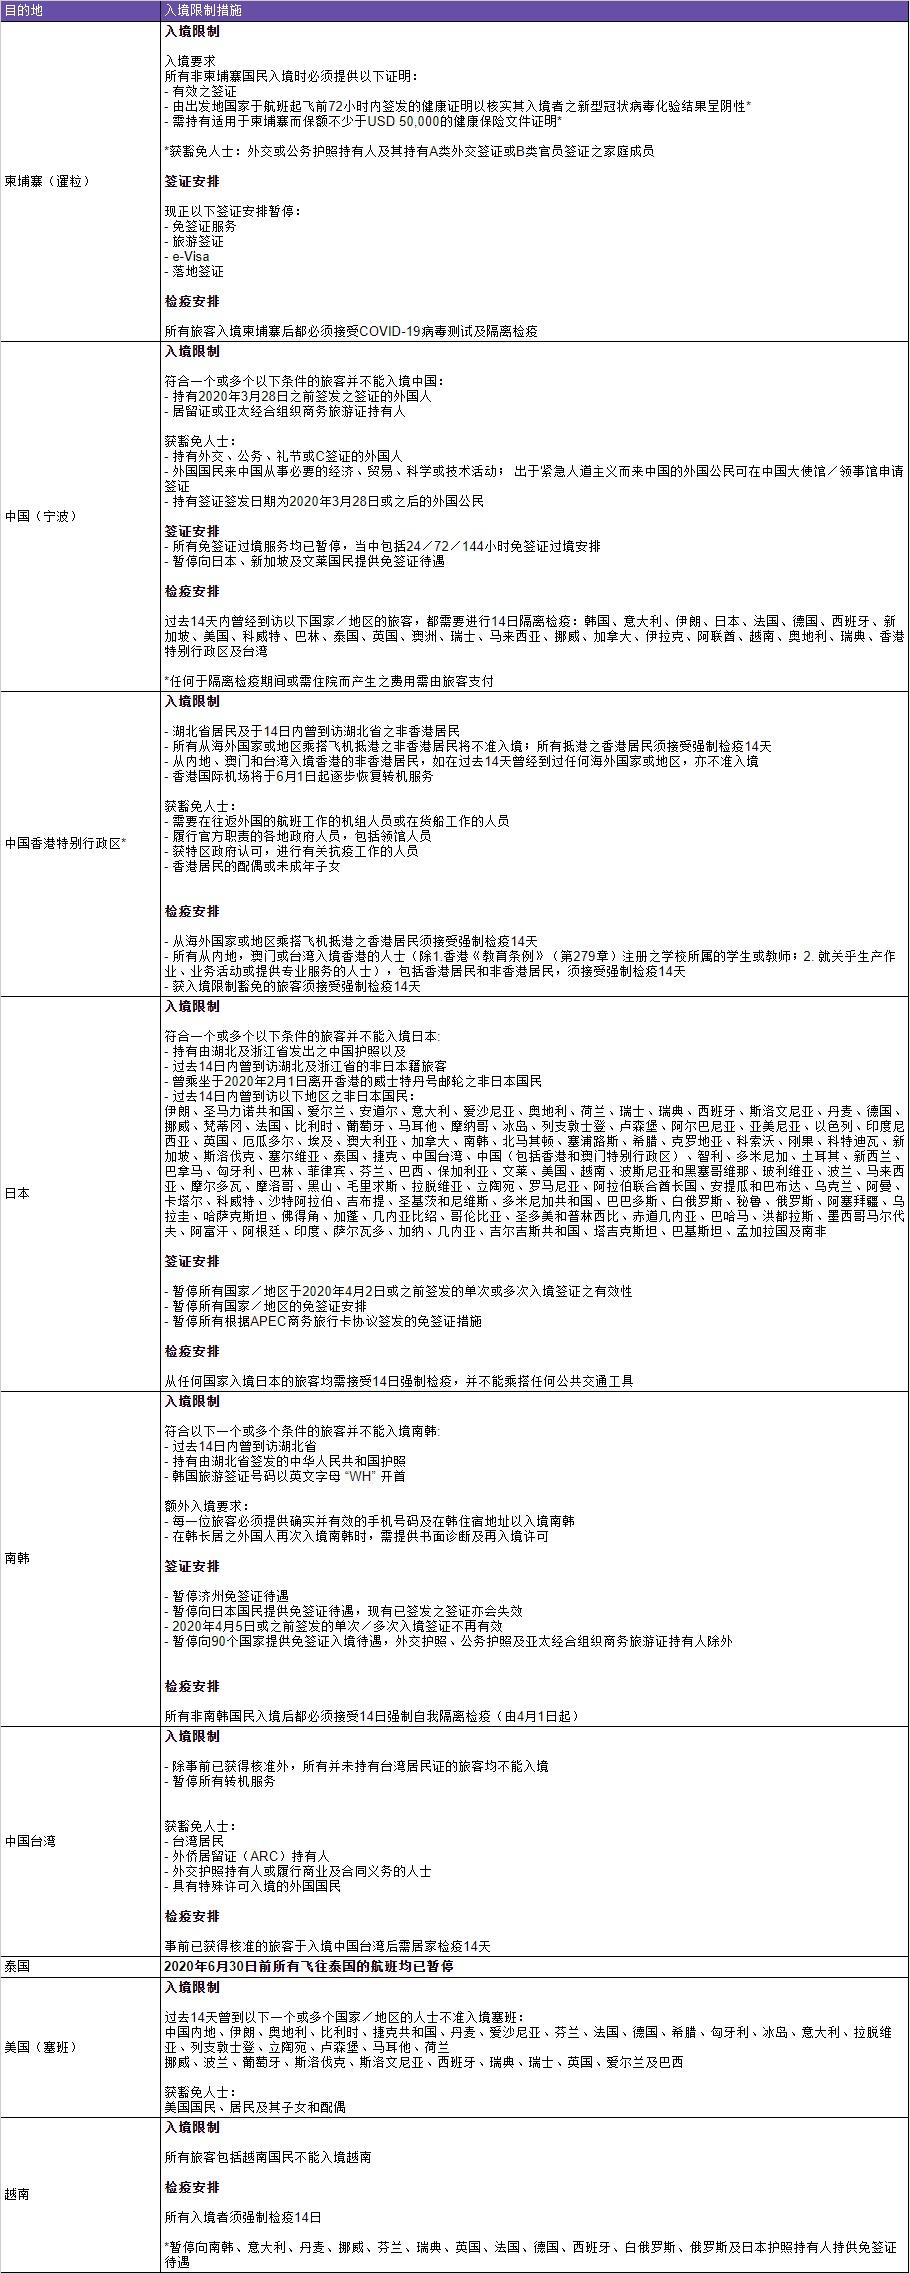 HK Express - 重要旅游注意事項